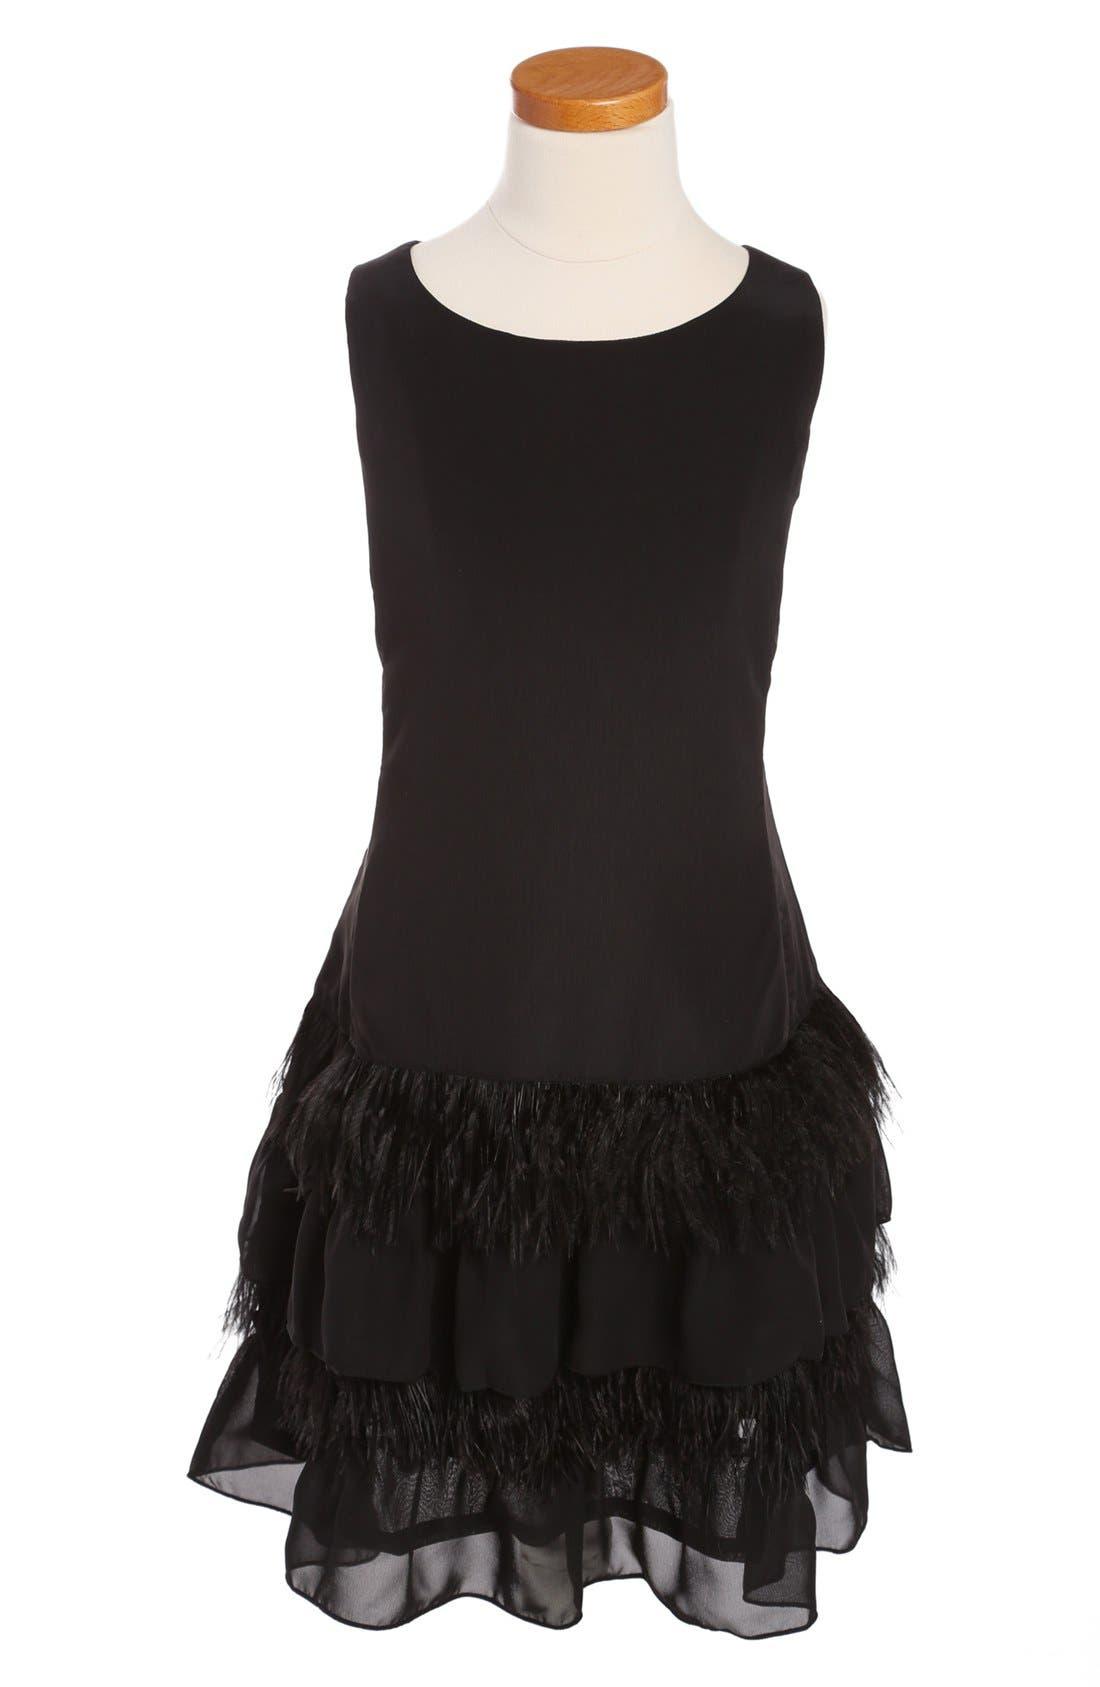 Alternate Image 1 Selected - Ruby & Bloom 'Hazel' Dress (Big Girls)